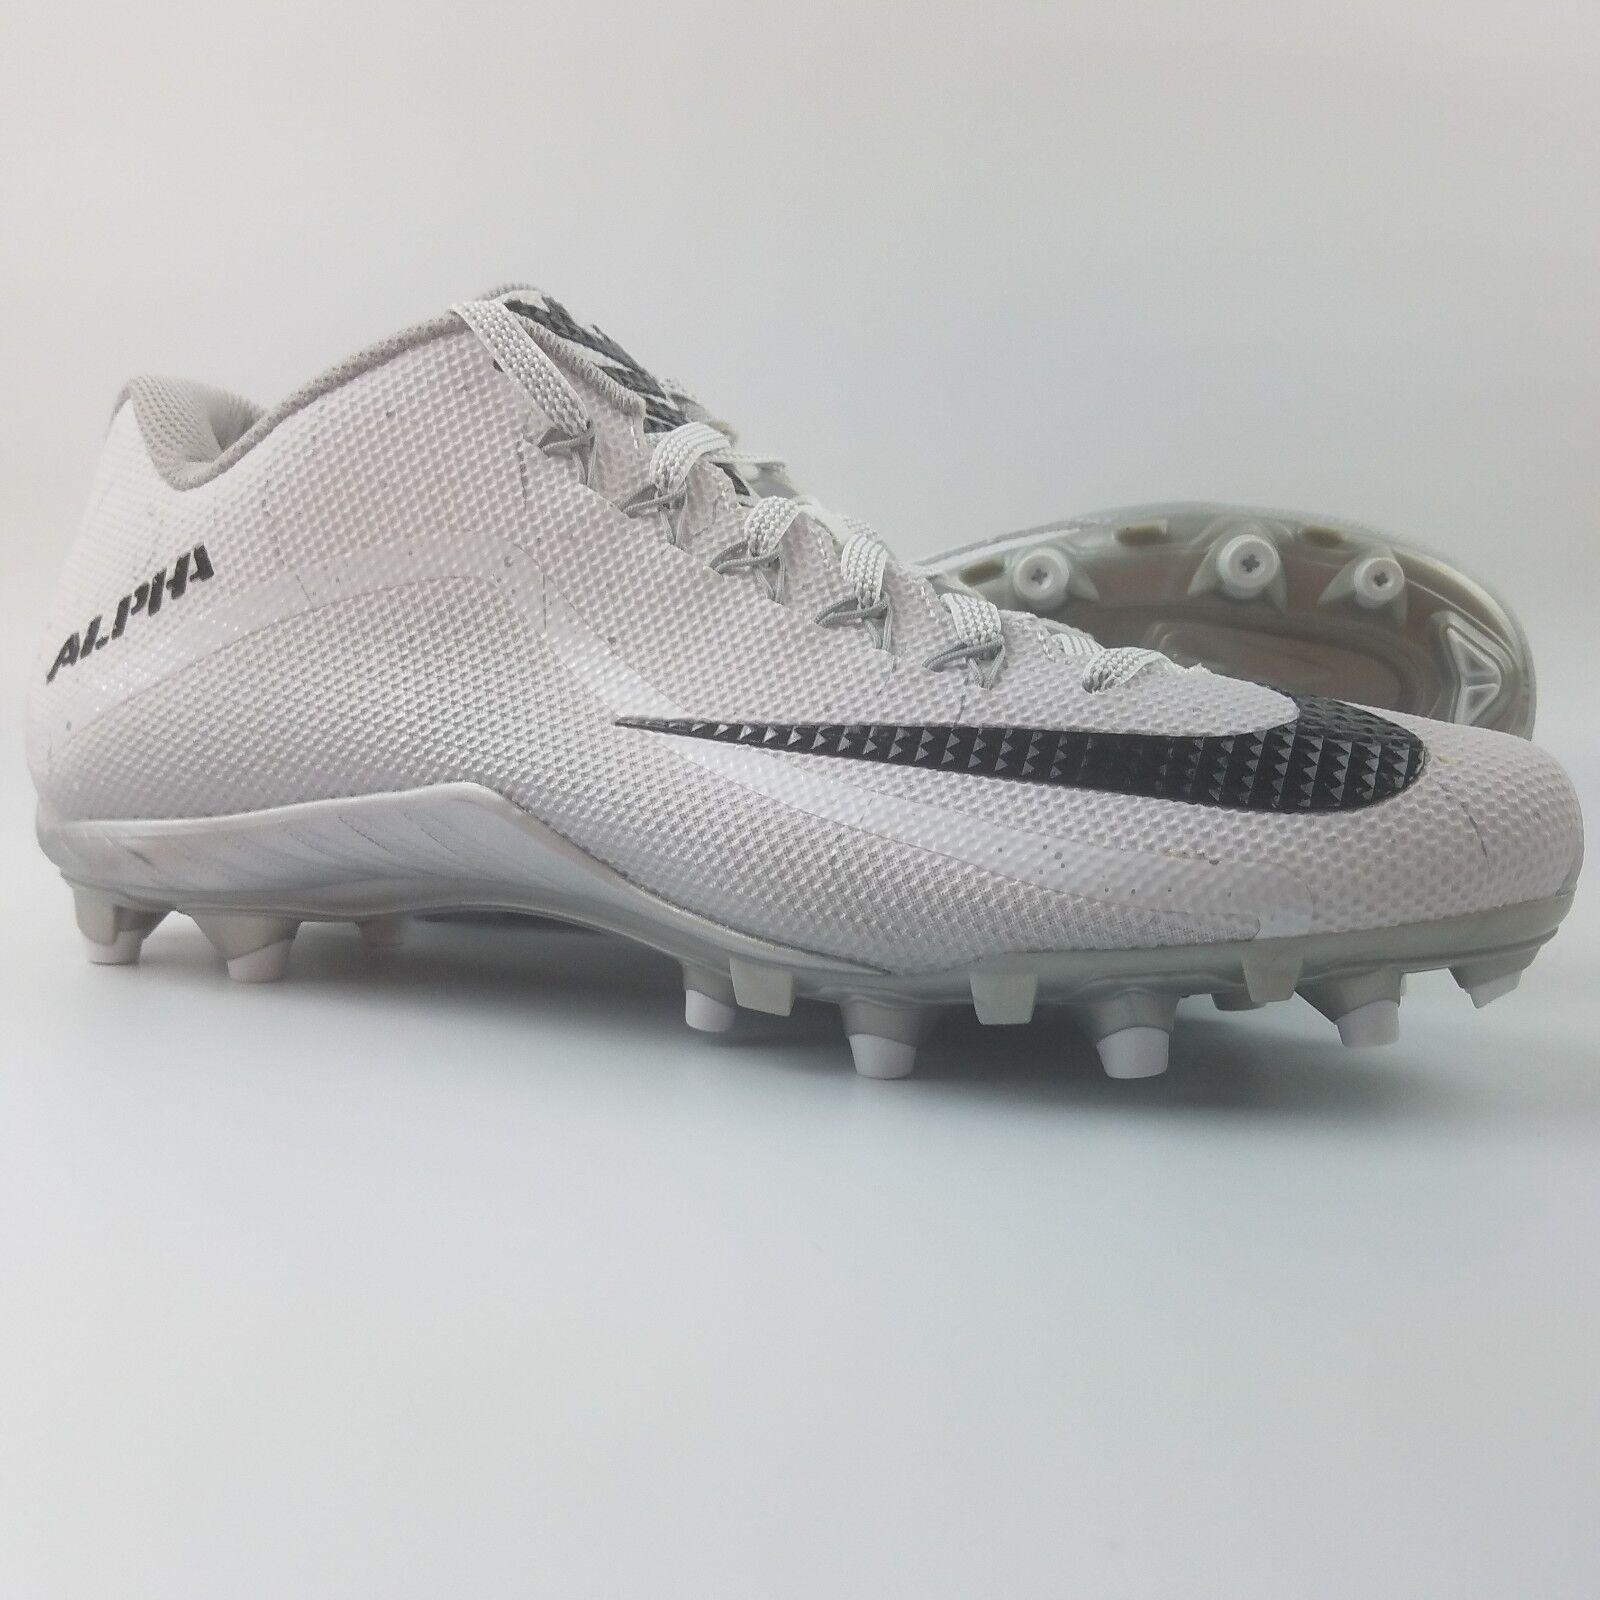 83cfa9ca4277 Nike Alpha Pro 2 TD Low Football Cleats Mens 719930-101 White Black ...